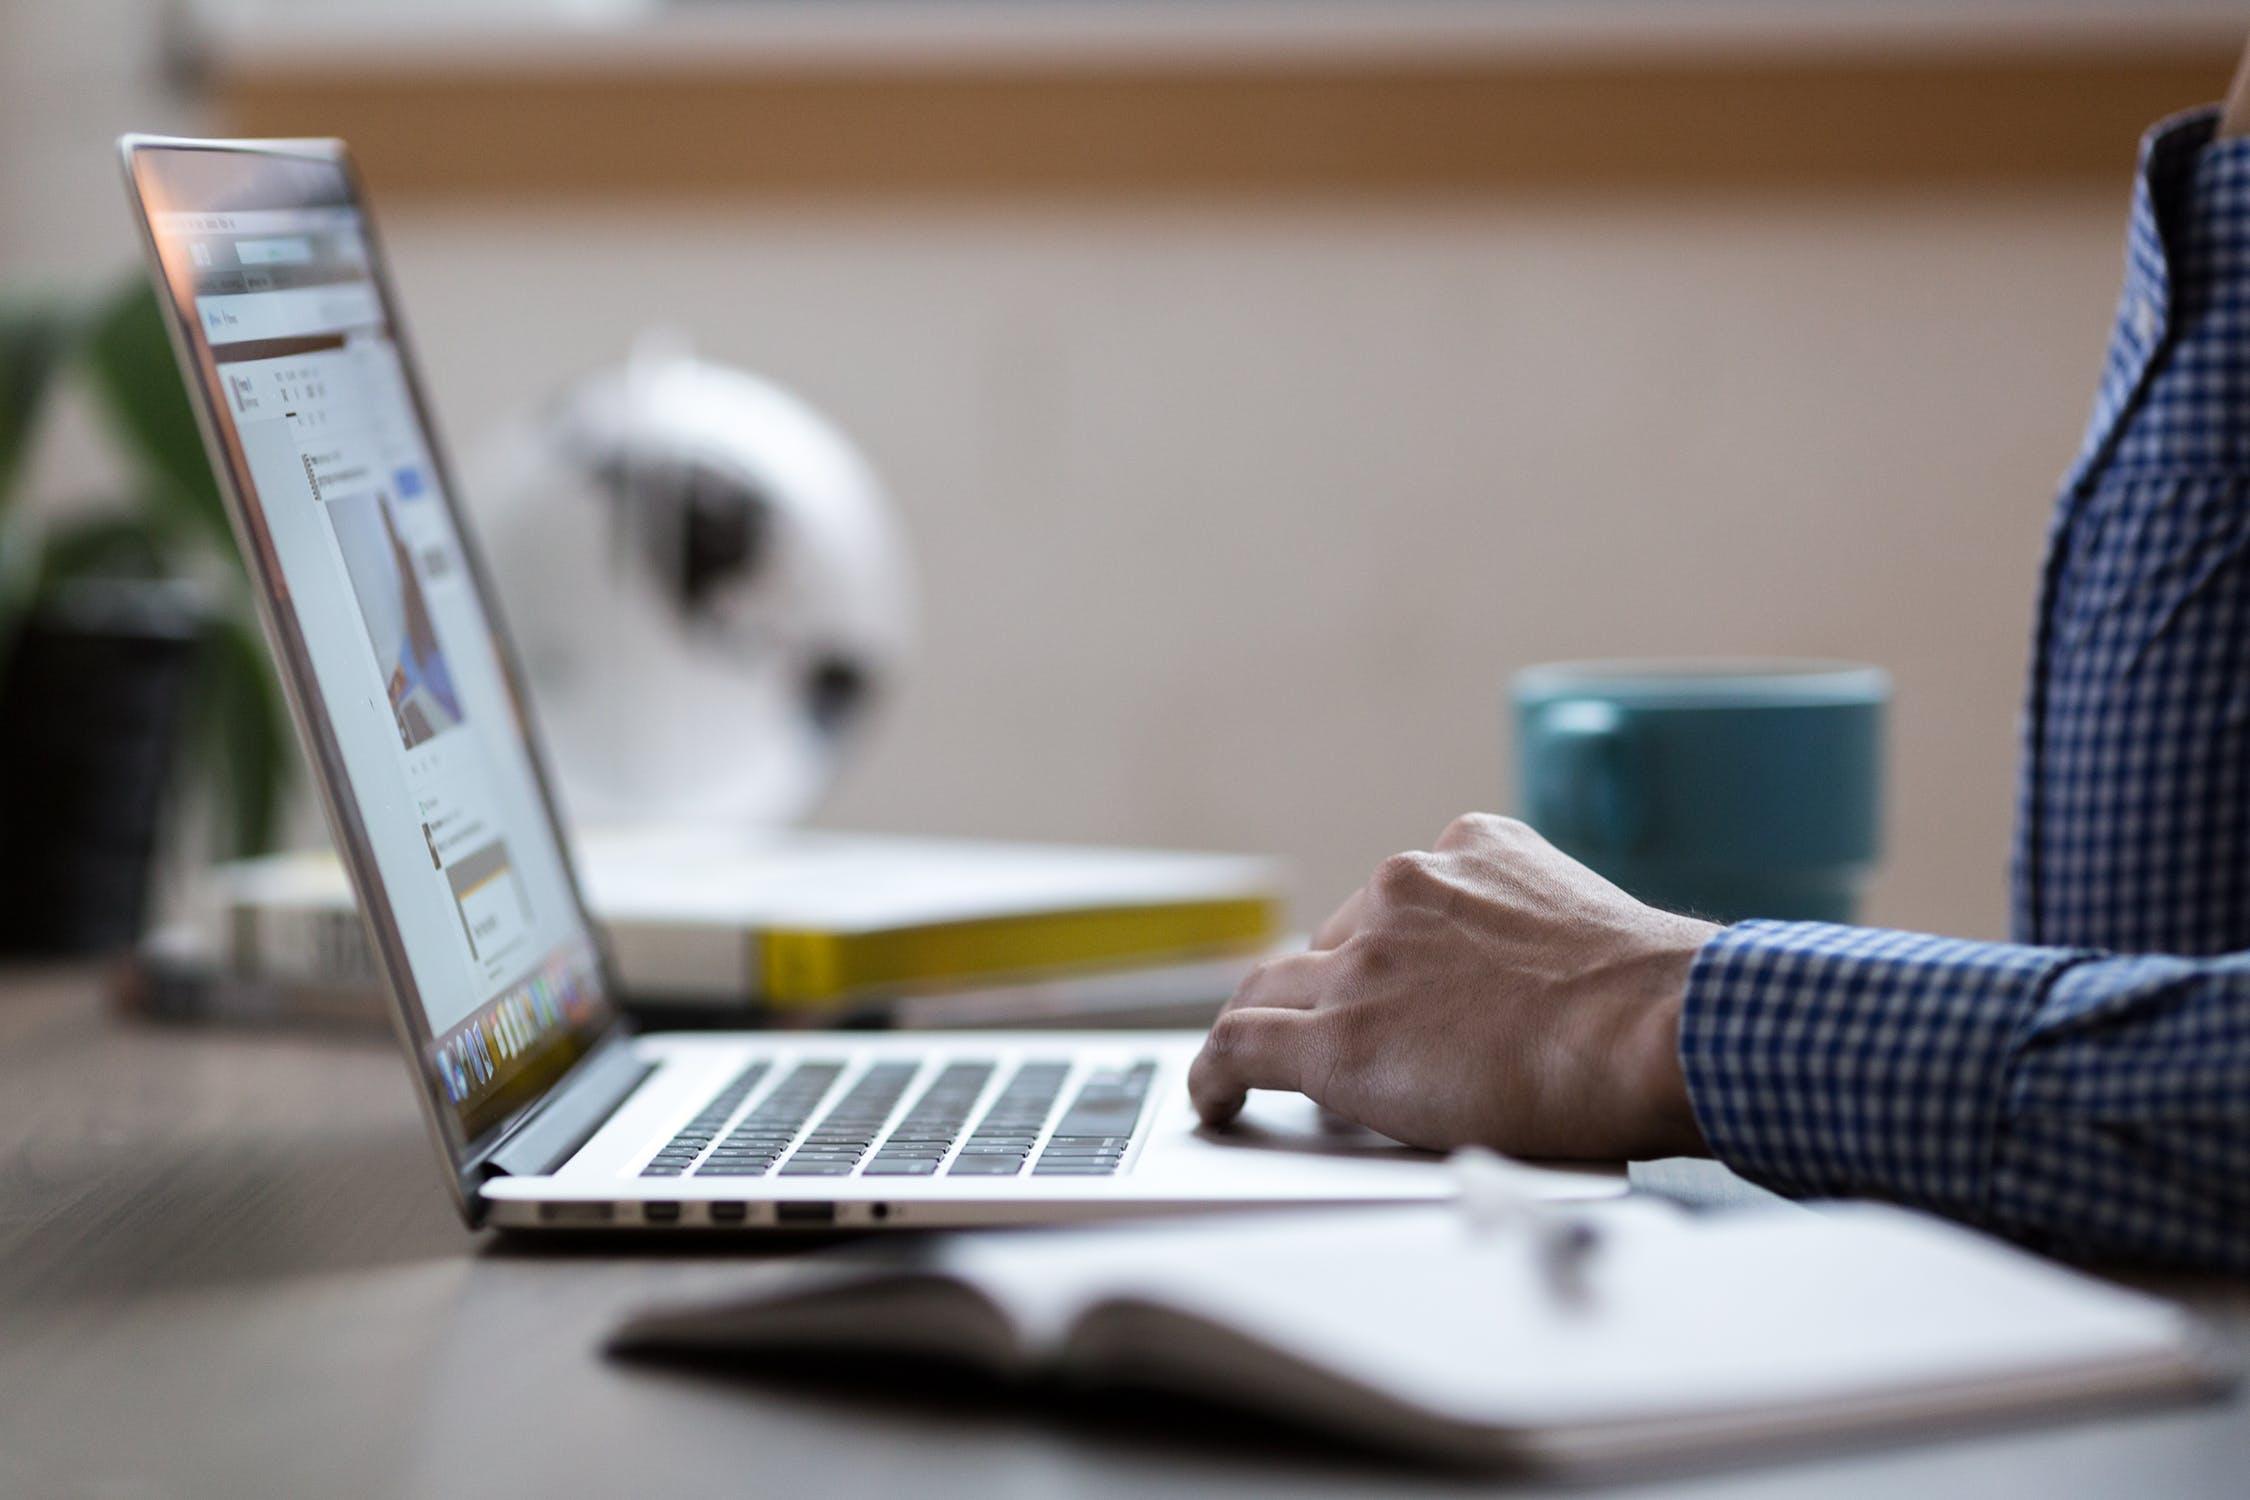 etude-e-commerce-reunion-habitudes-internautes-achats